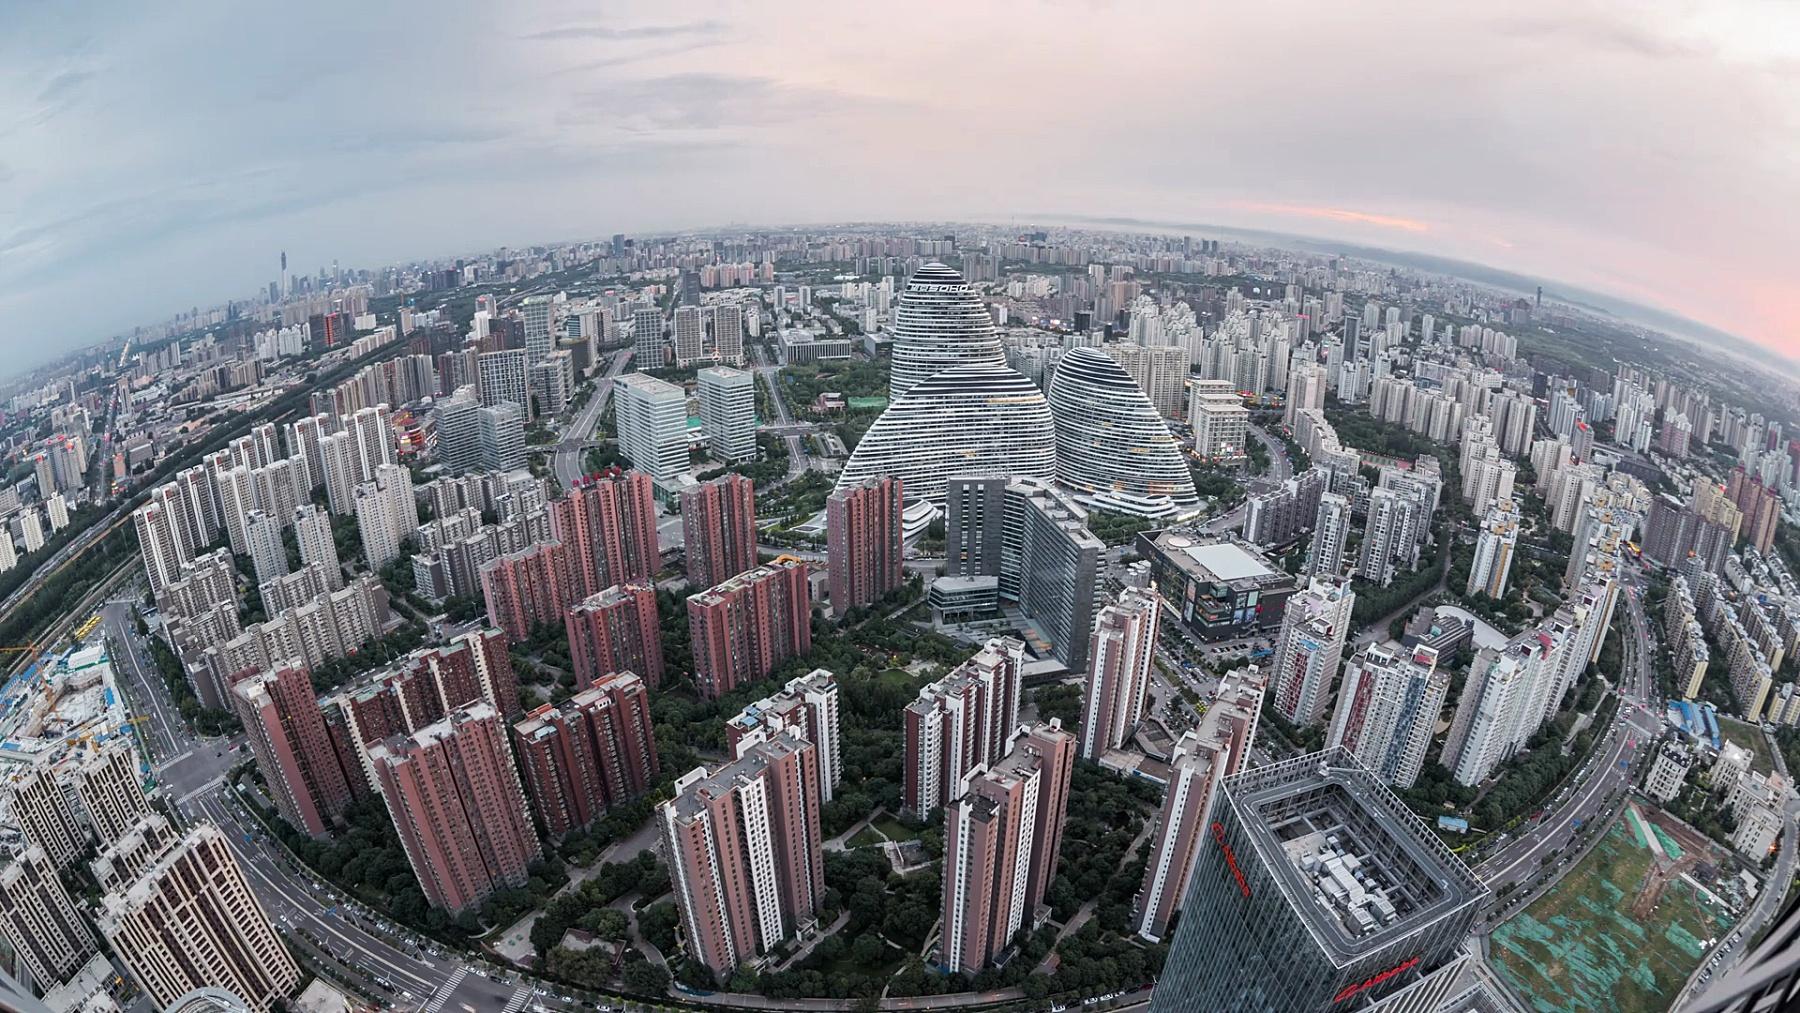 中国北京/北京市中心T/L菲舍耶景观(T/L Fisheye View of Downtown Beijing/Beijing,China)